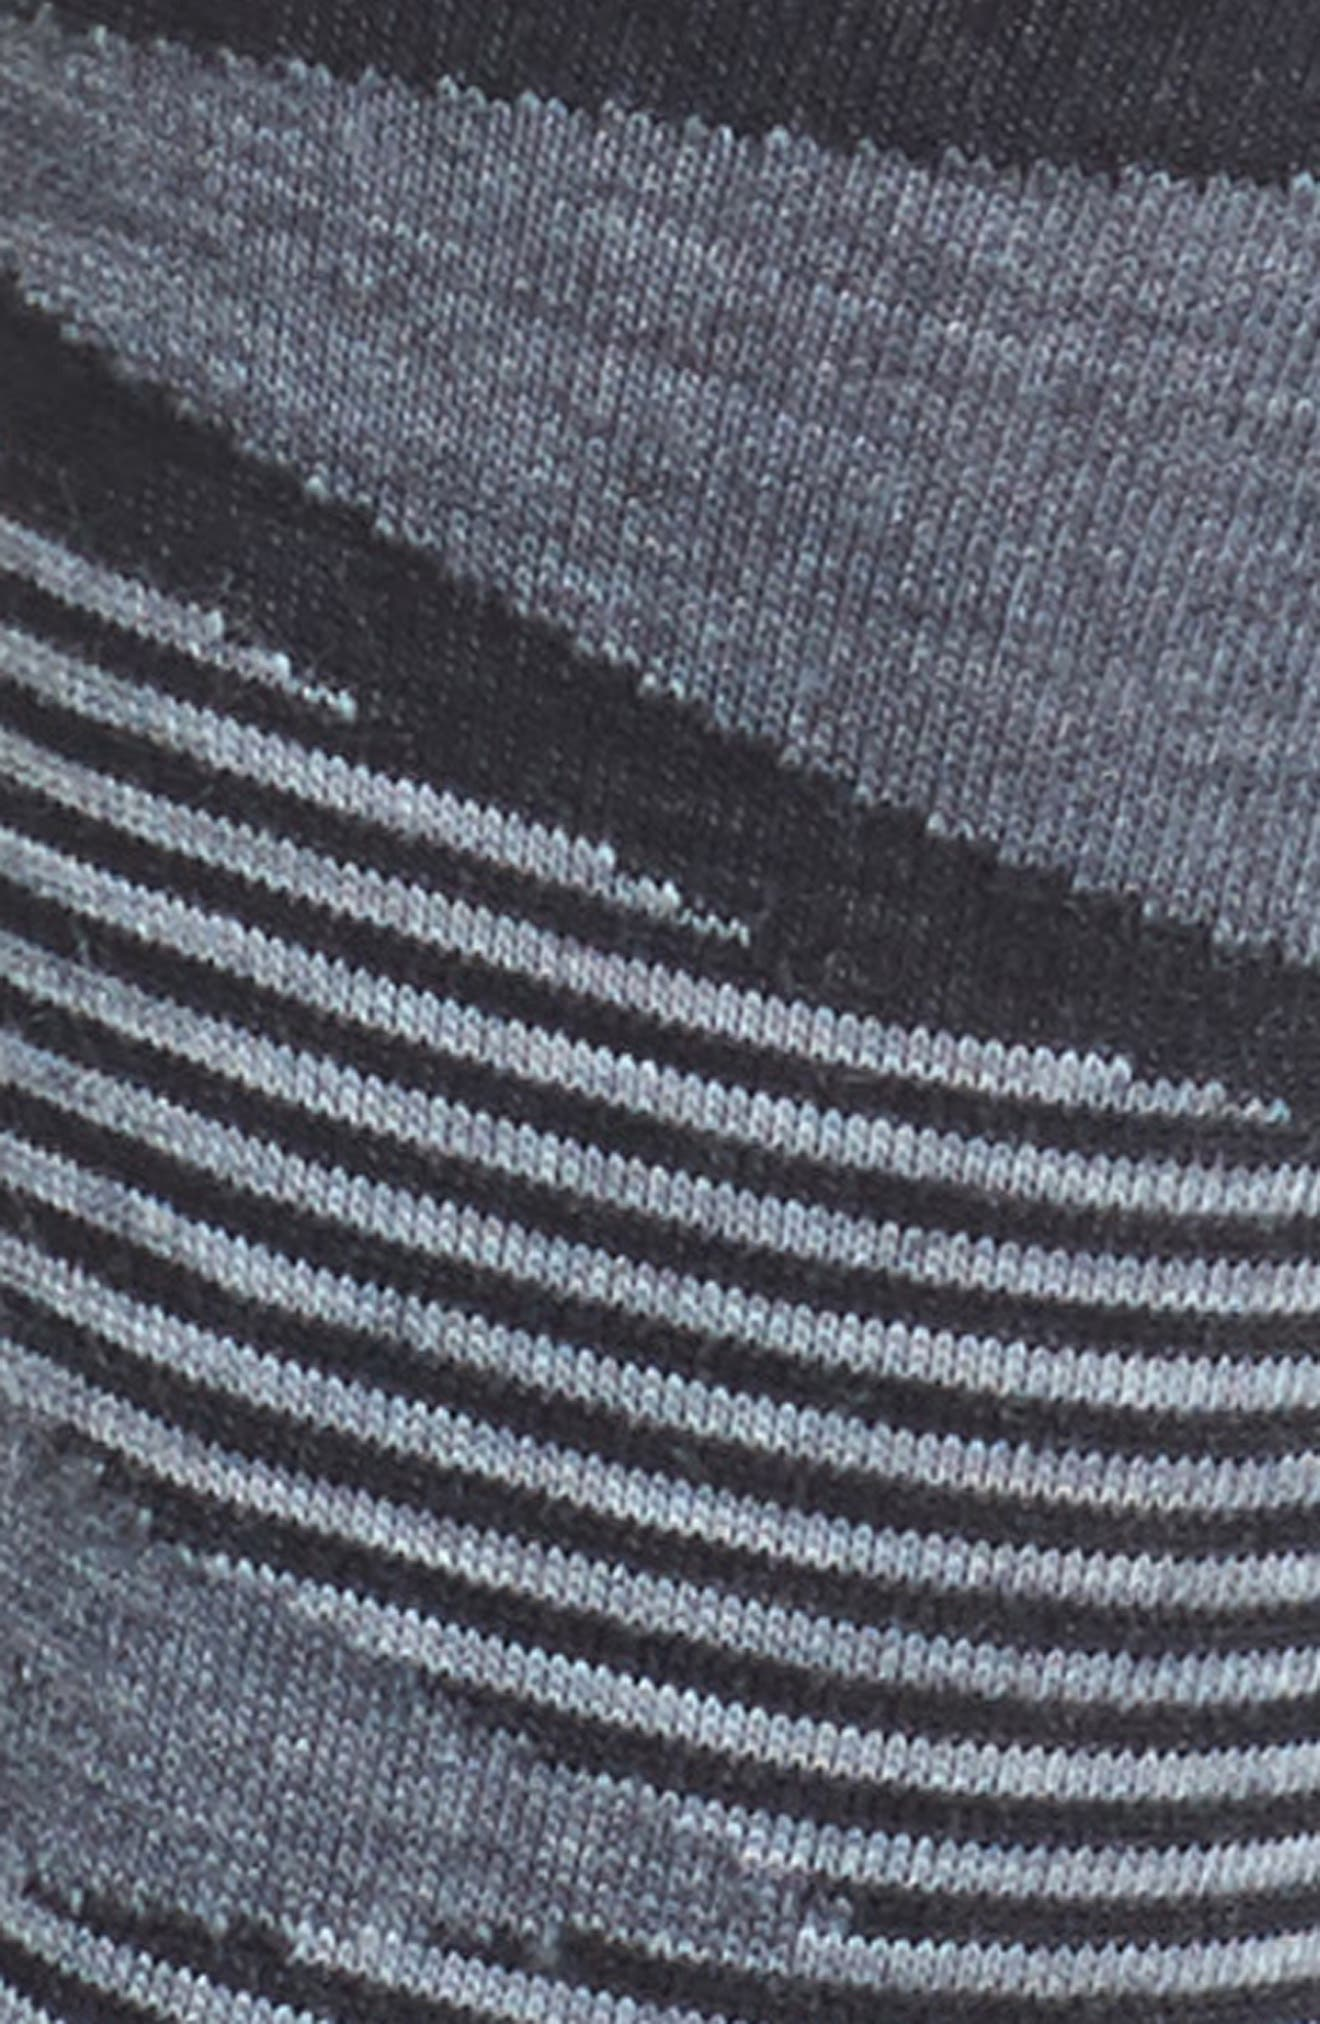 First Mate Crew Socks,                             Alternate thumbnail 2, color,                             Black